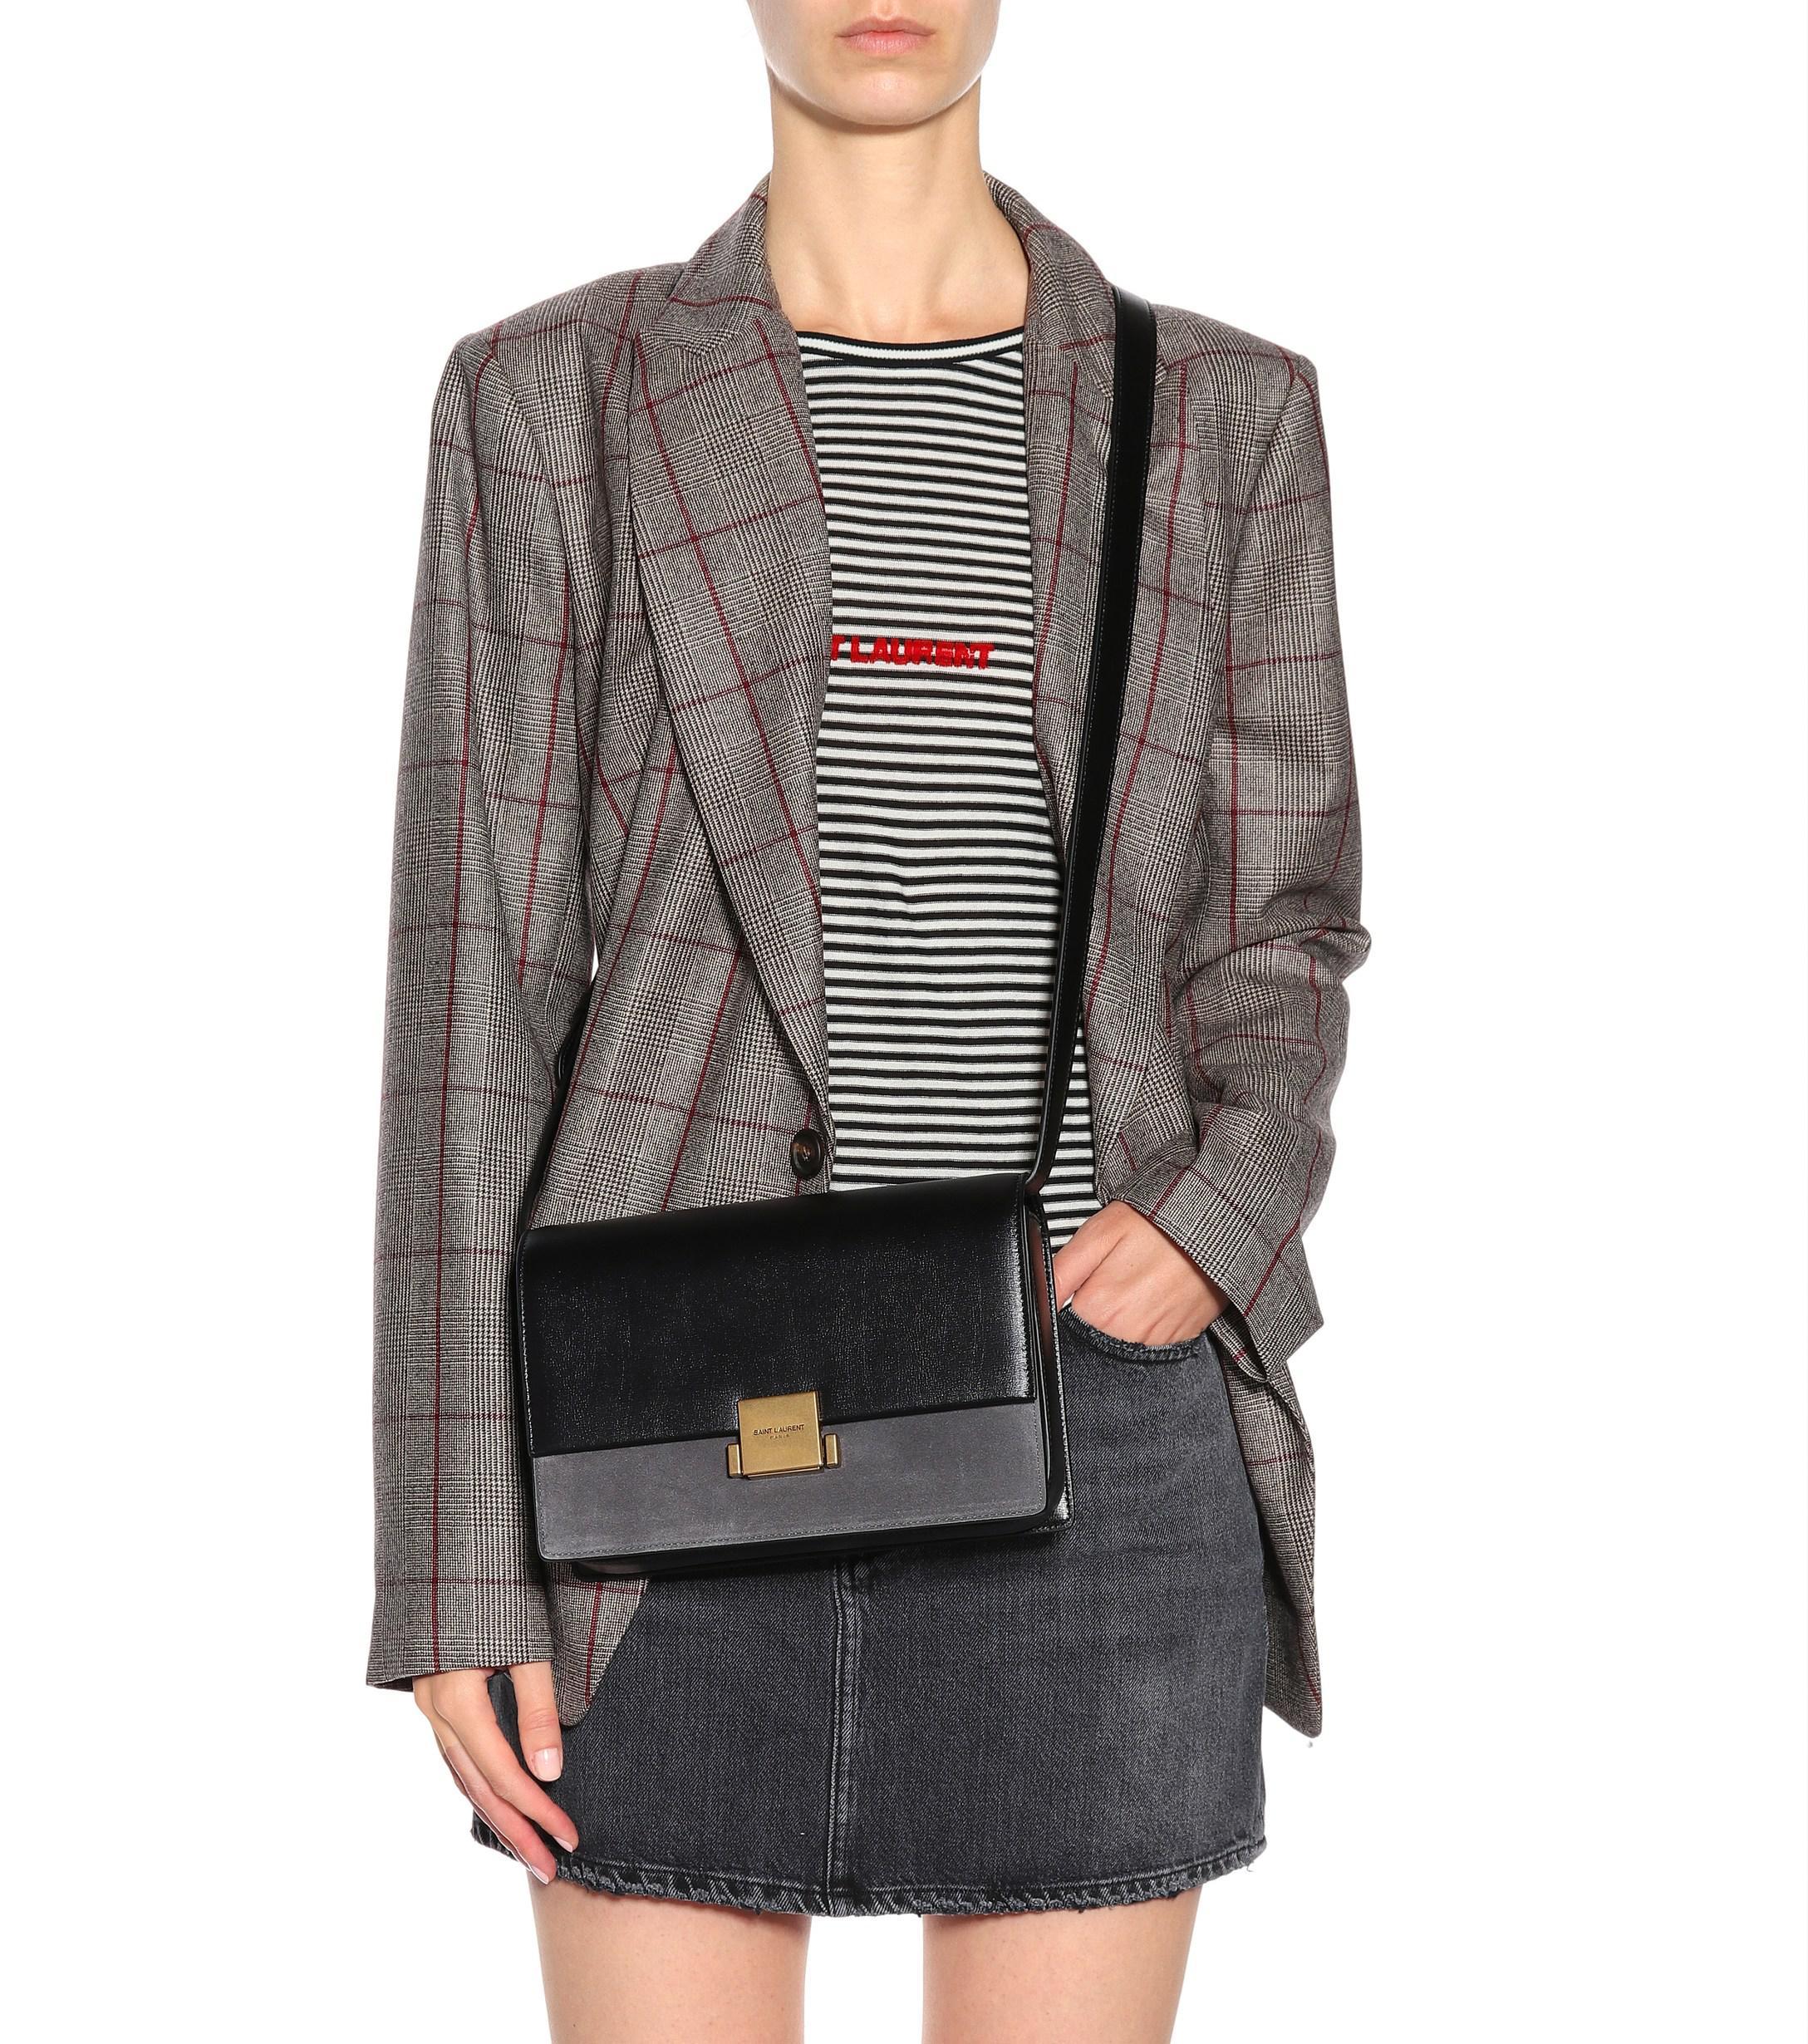 f98fa0ebc Saint Laurent Medium Bellechasse Crossbody Bag in Gray - Lyst